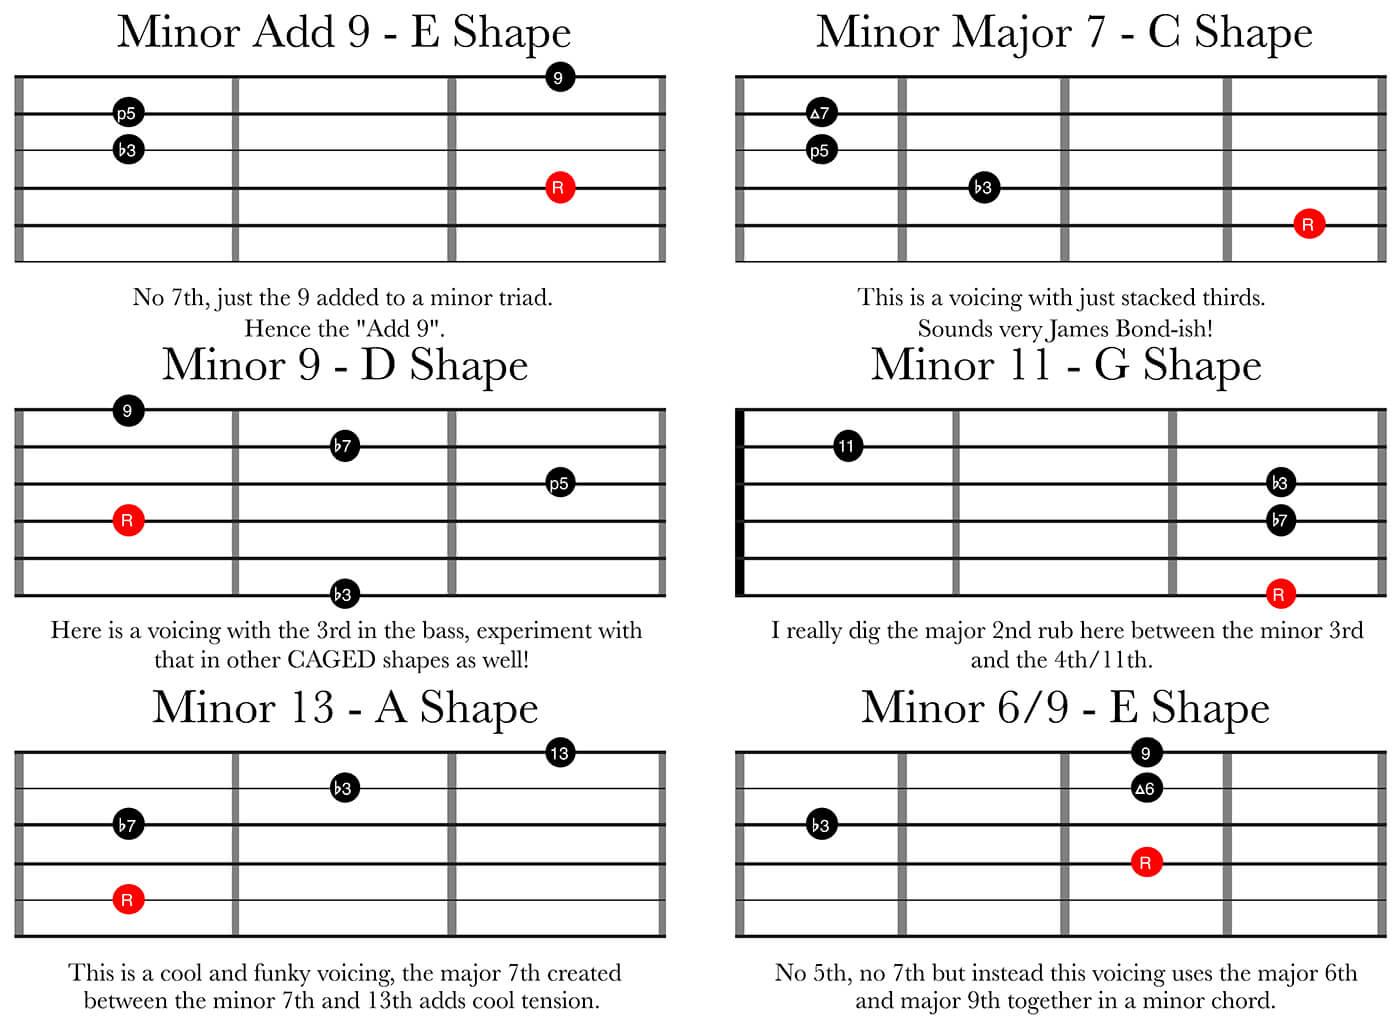 Minor Chords - Upper Extensions